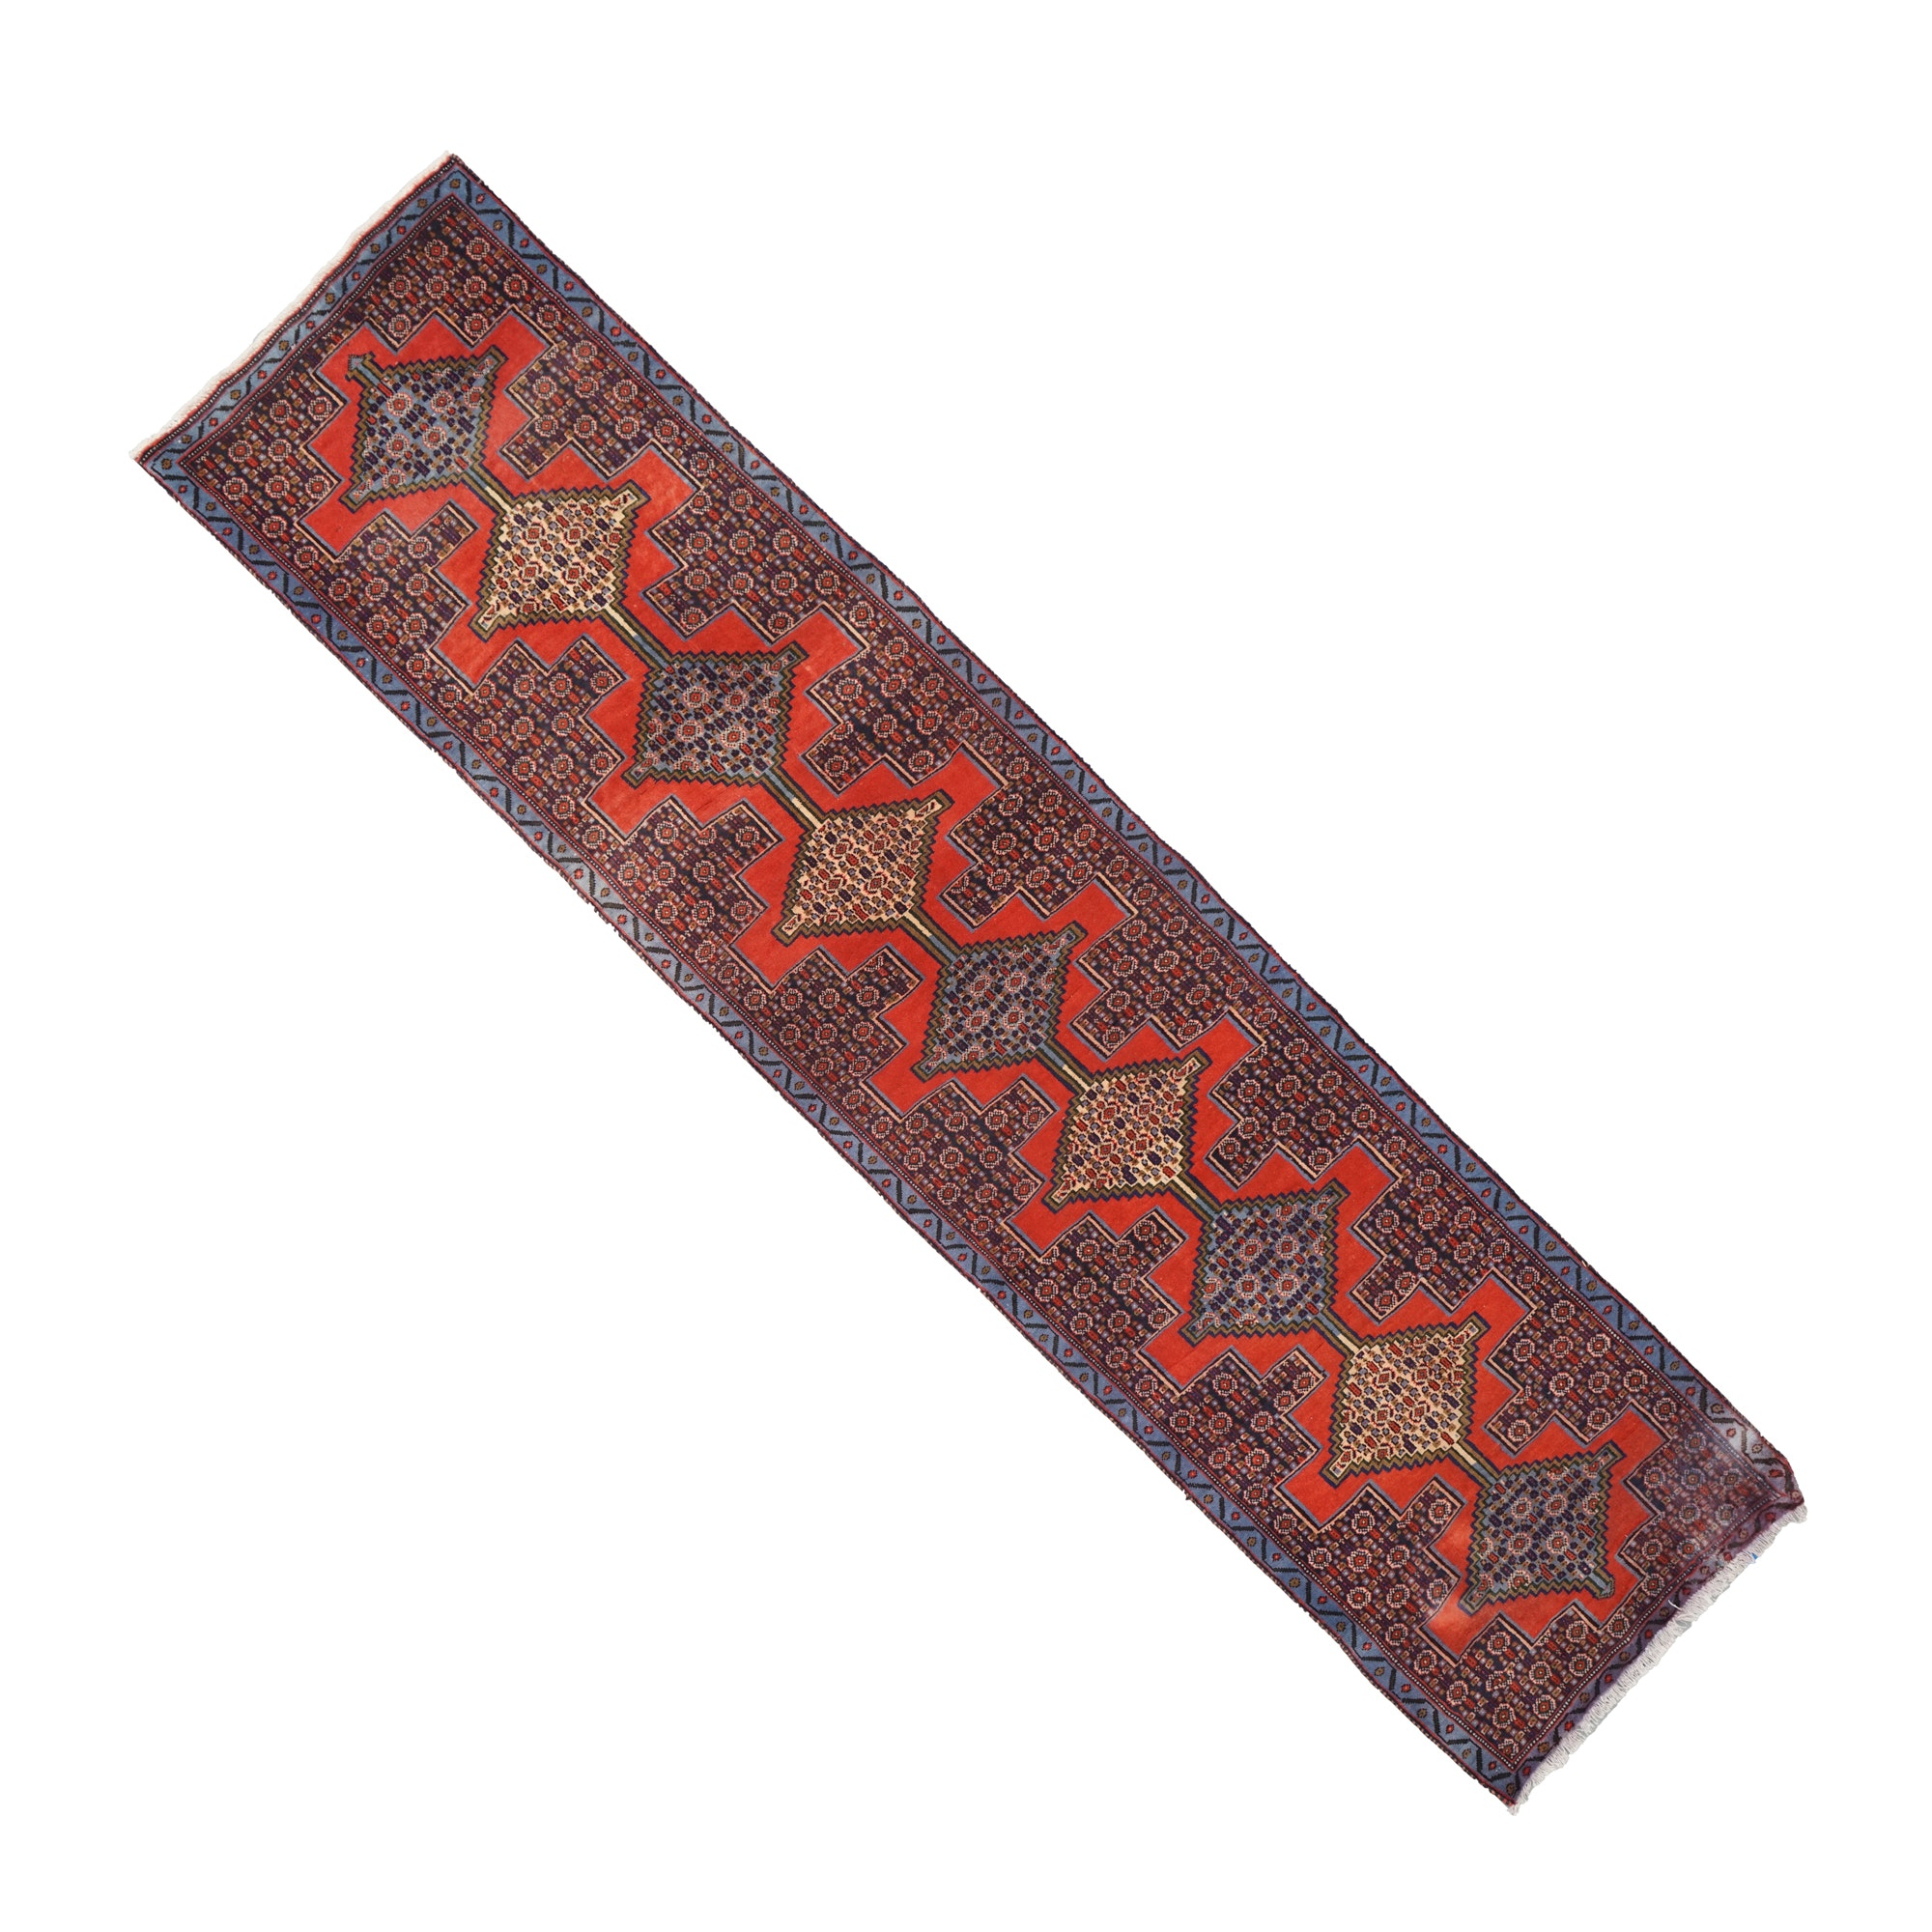 Hand Knotted Caucasian Wool Carpet Runner